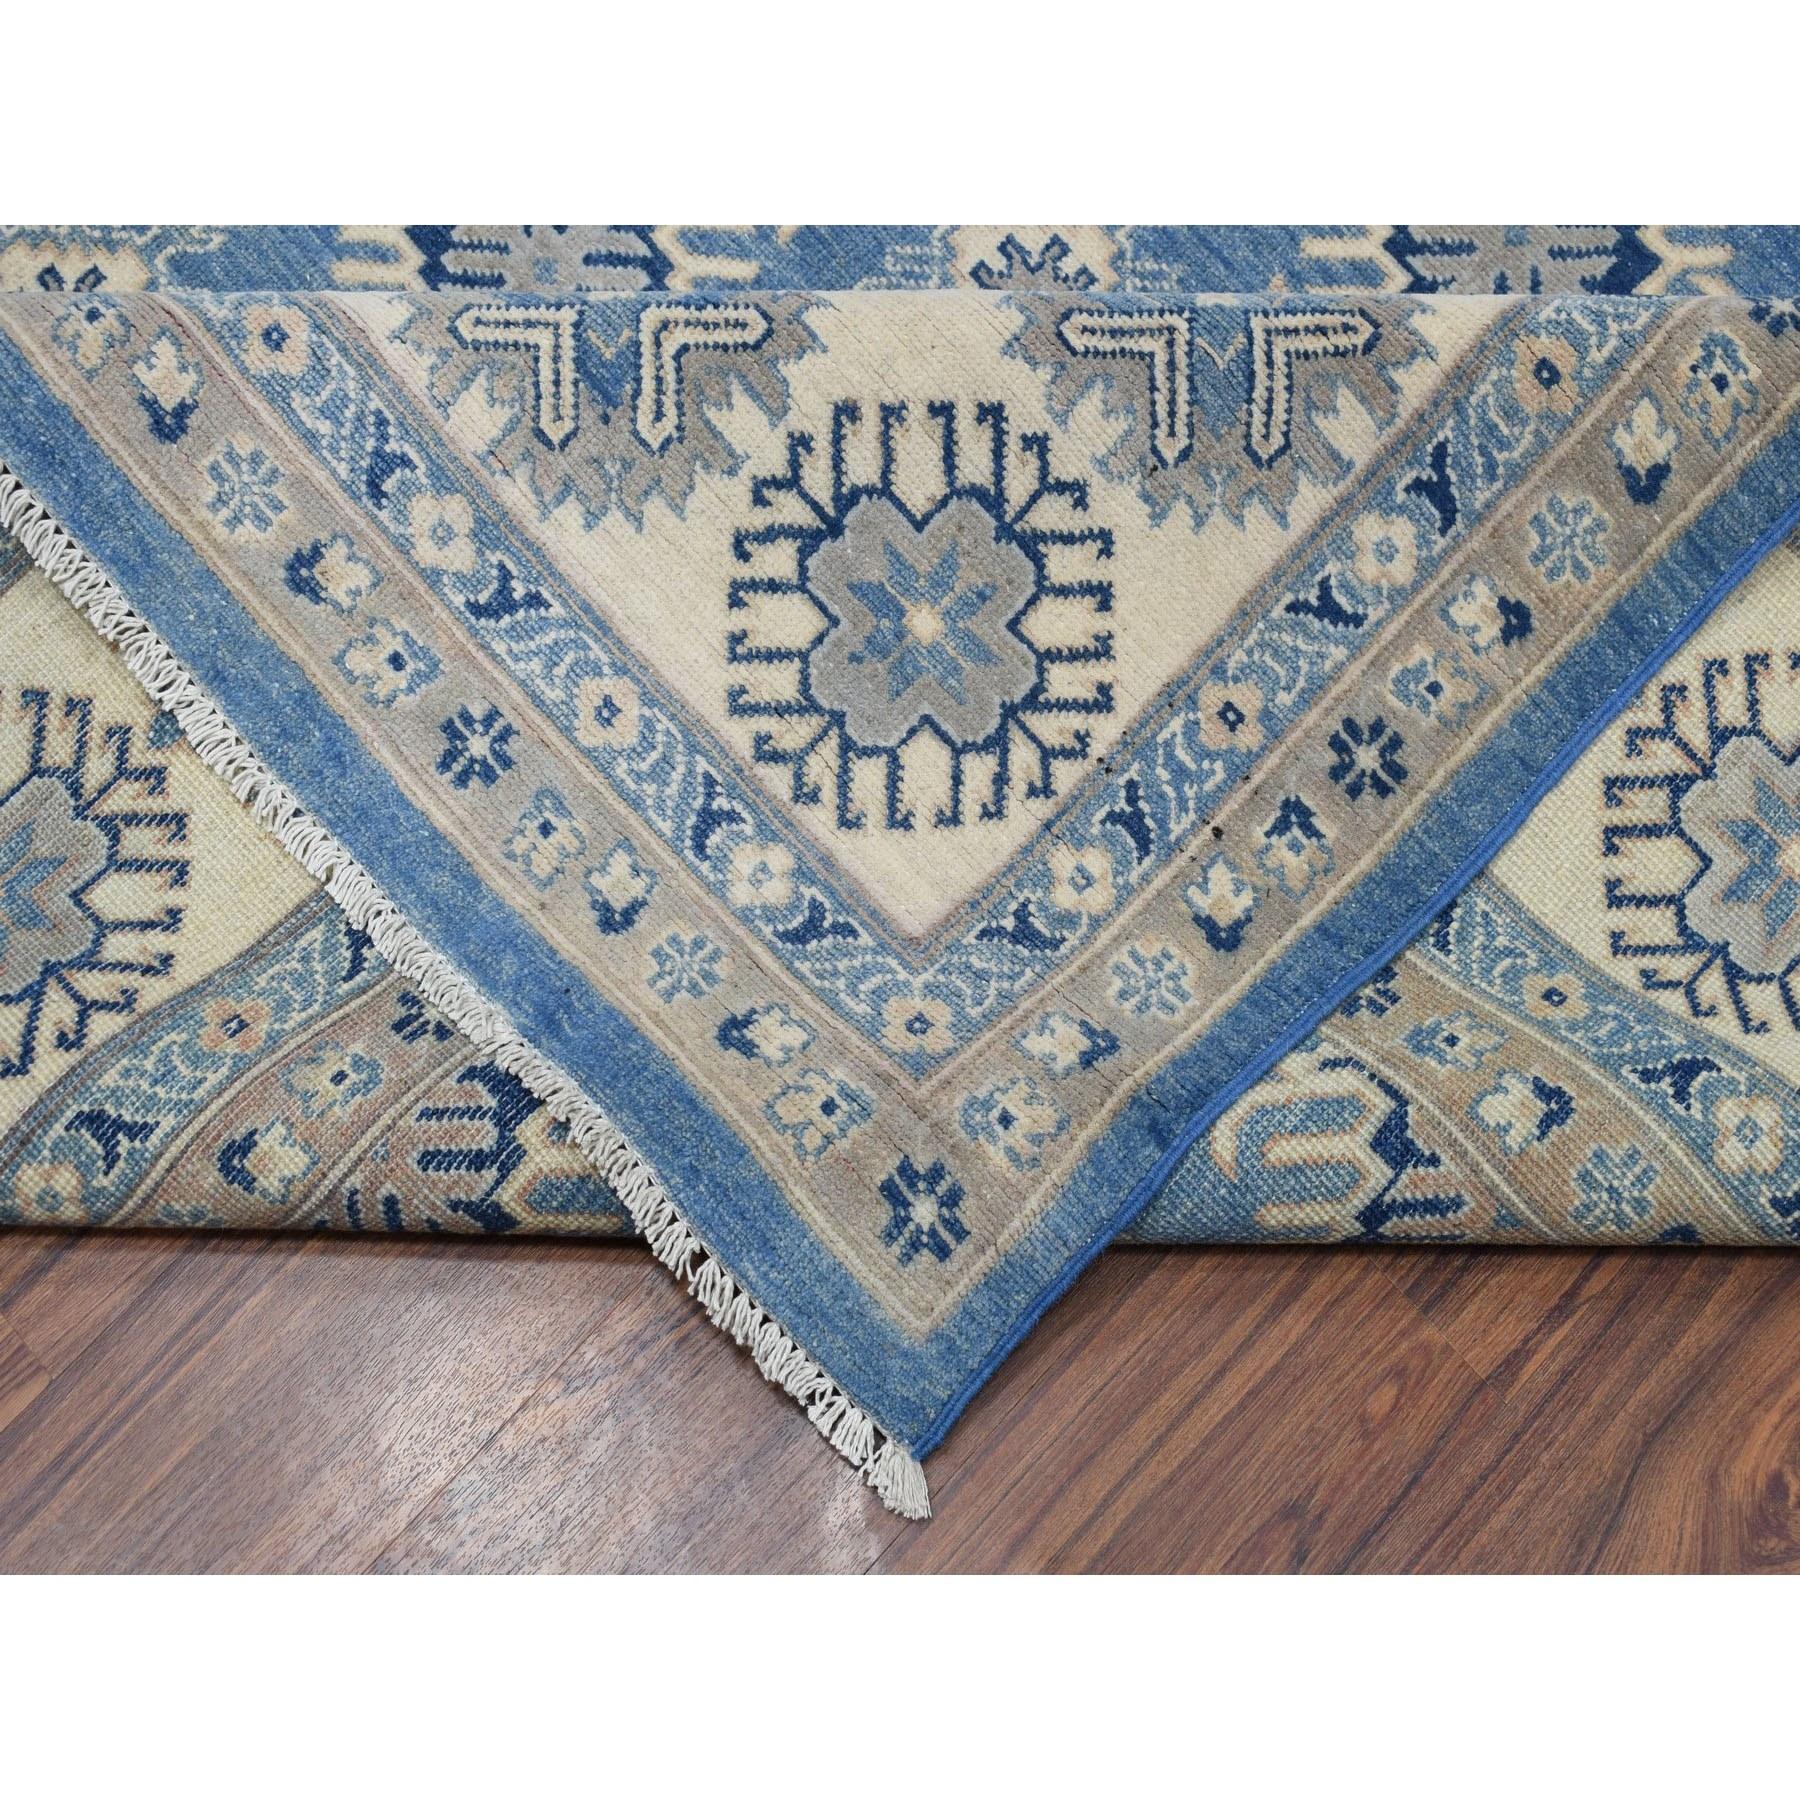 "9'8""x13'5"" Blue Vintage Look Kazak Geometric Design Pure Wool Hand Knotted Oriental Rug"